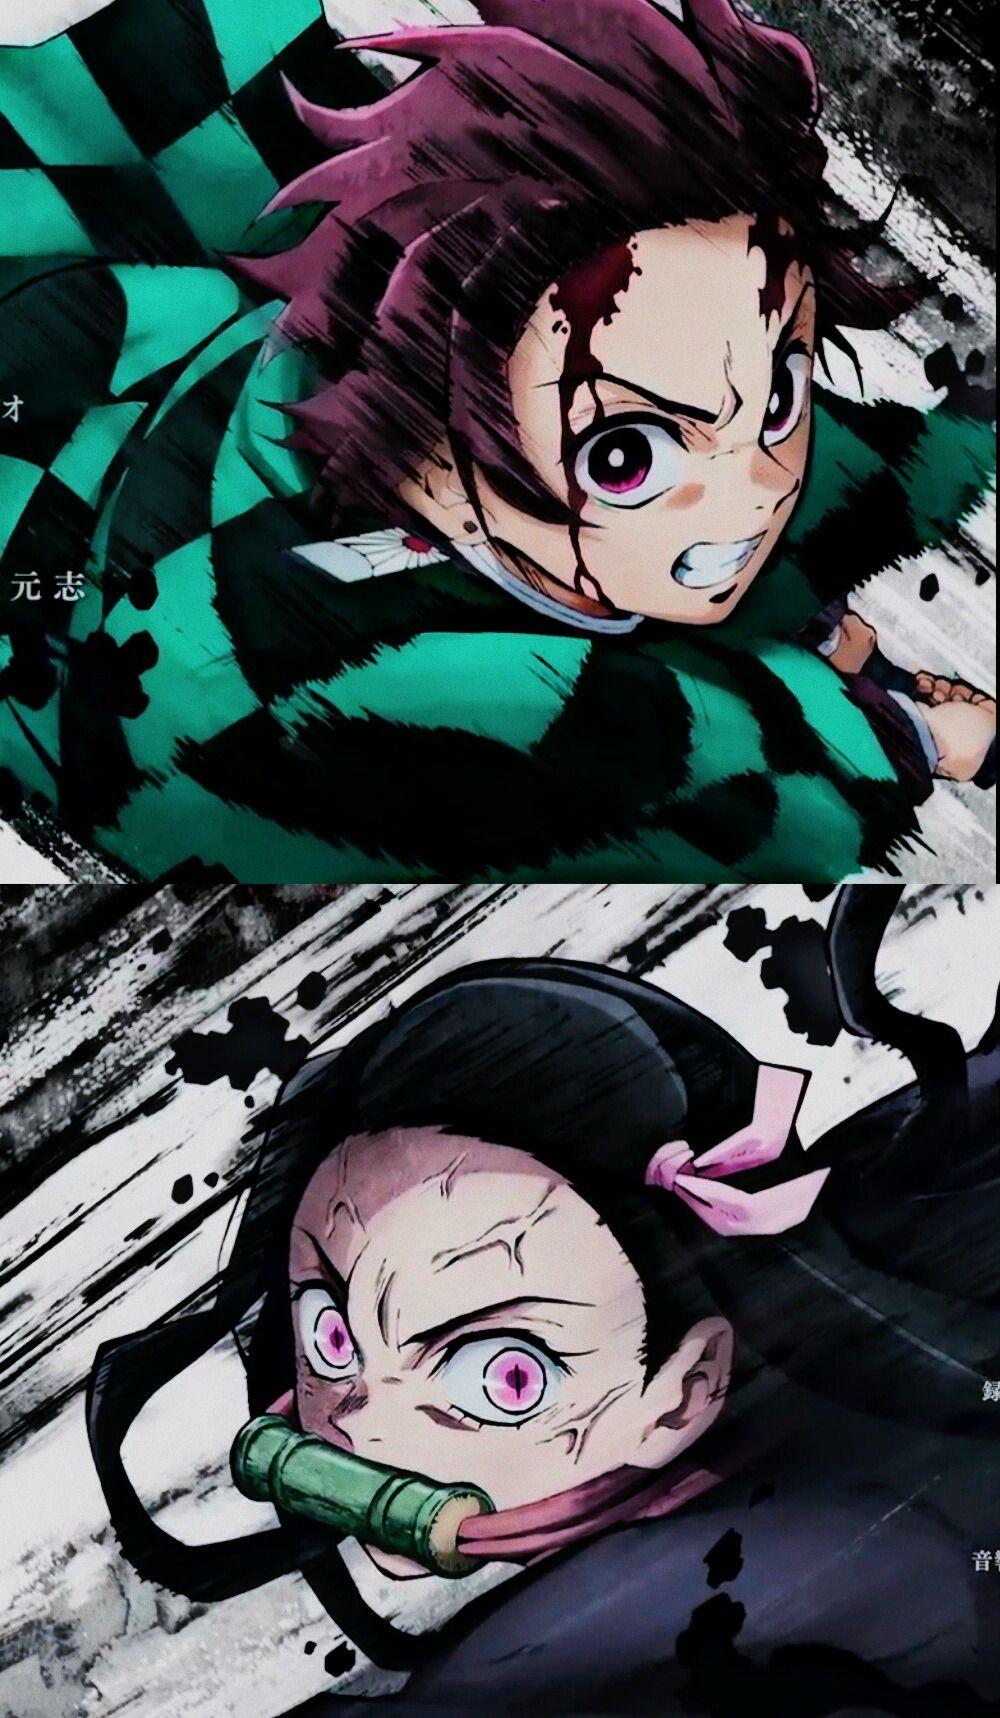 Wallpaper Kimetsu No Yaiba Fav Reblog If You Save Anime Demon Slayer Anime Anime Fanart Anime wallpaper demon slayer manga